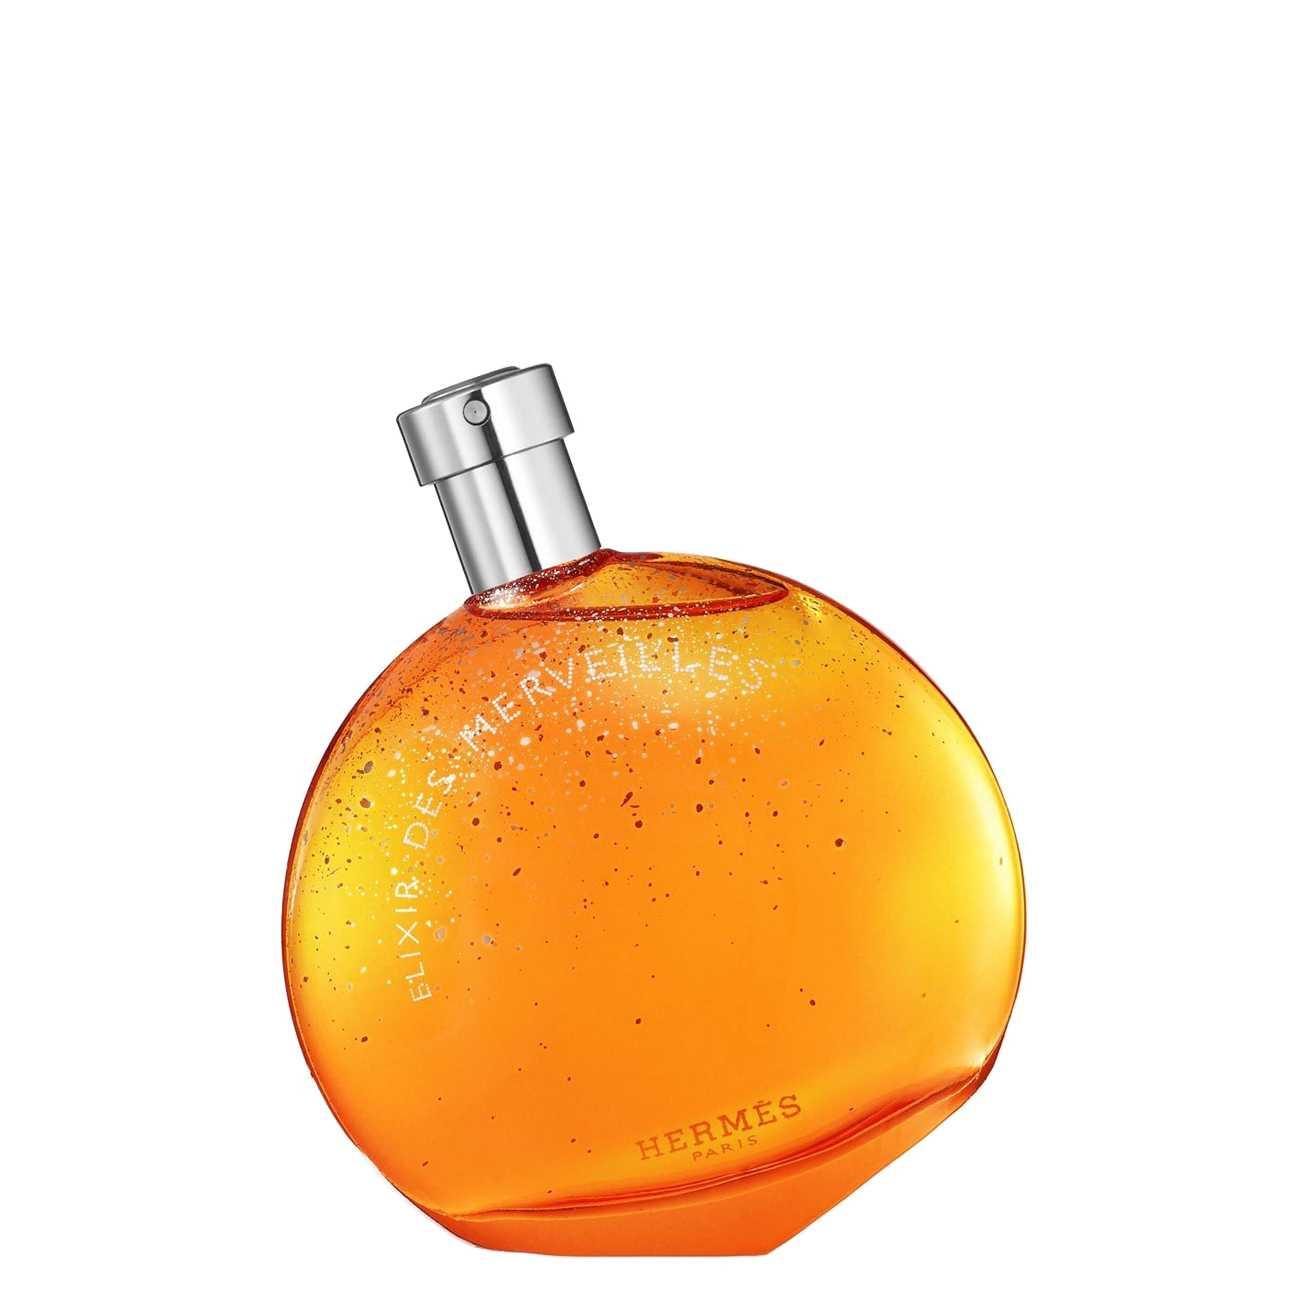 Elixir Des Merveilles 50 Ml 50ml Hermes imagine 2021 bestvalue.eu